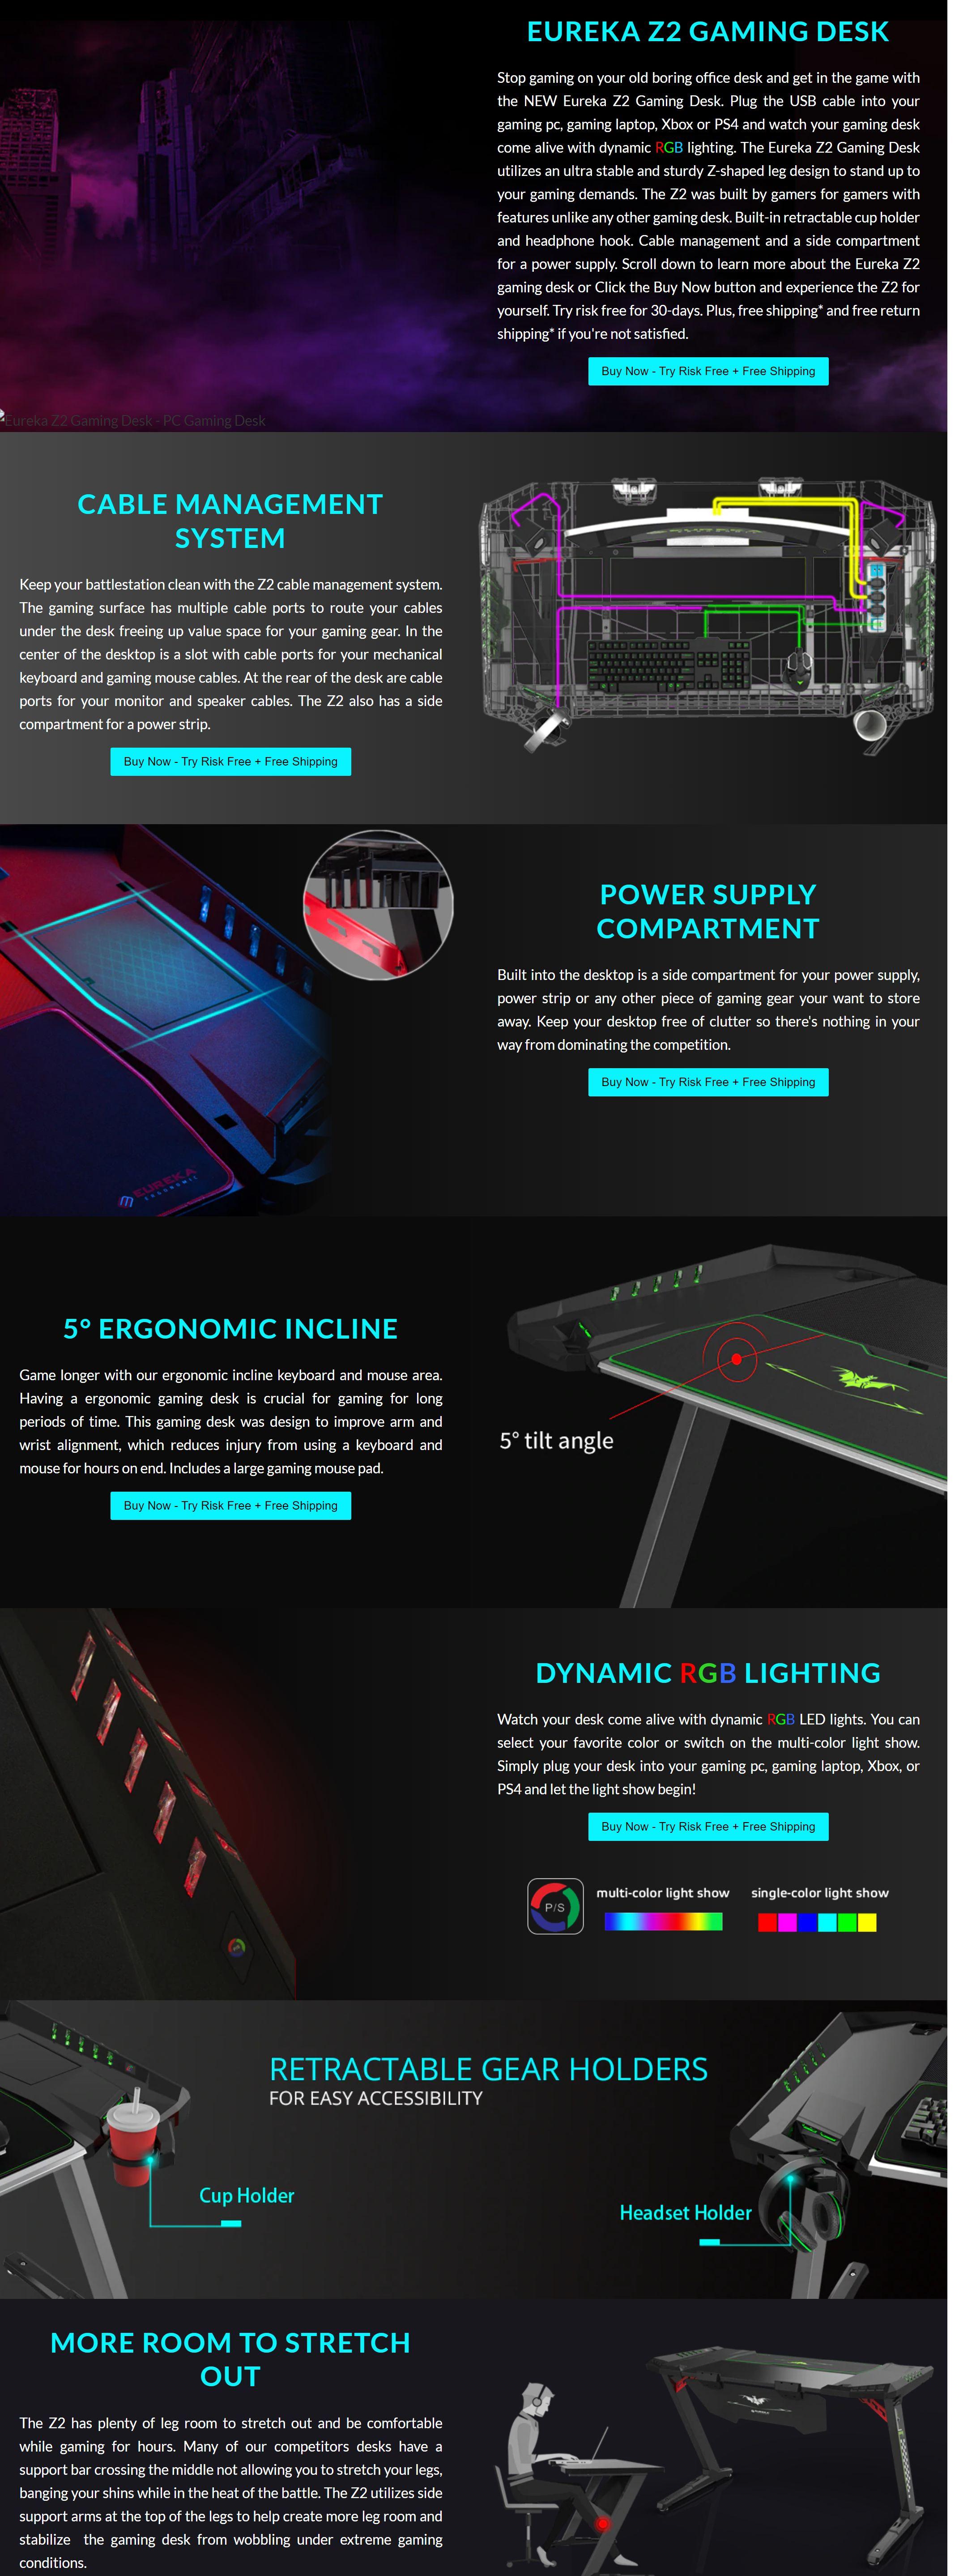 #1726 - 'Z2 PC Gaming Desk With LED Lights - Retractable Cup Holder & Headset Hook' - eurekaergonomic_com.jpg